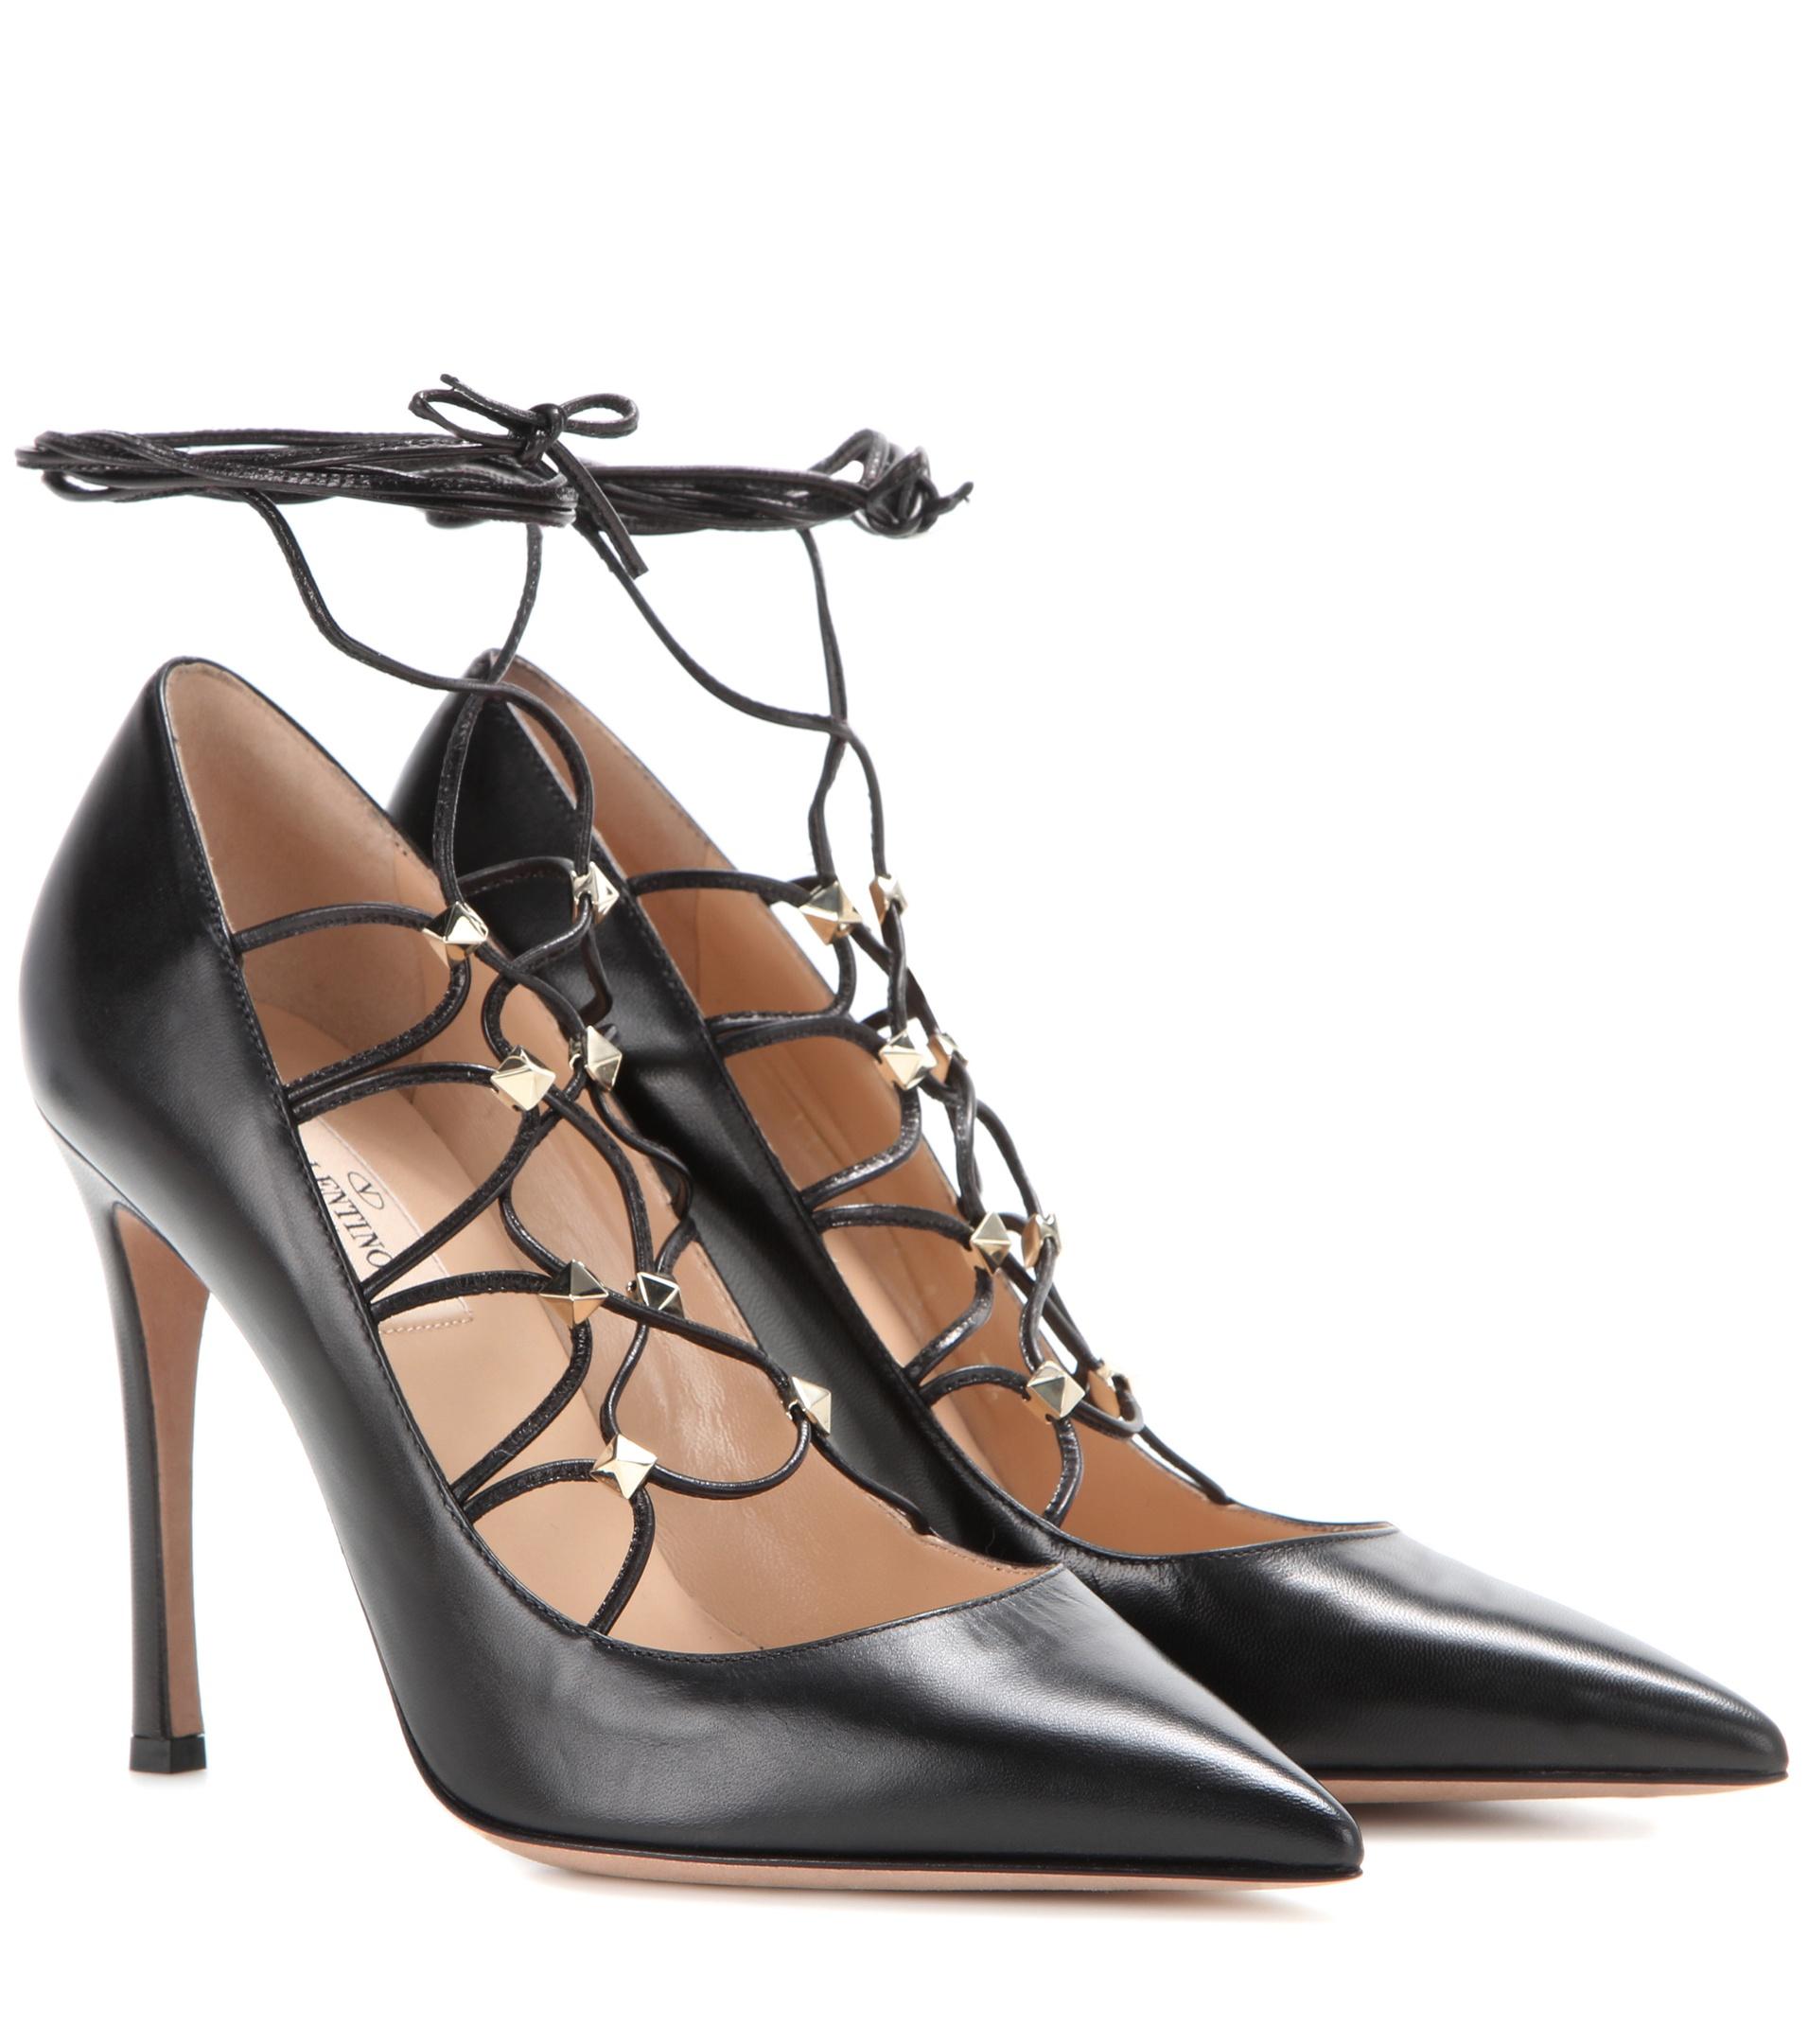 Valentino black l;rather lace up rockstud pumps